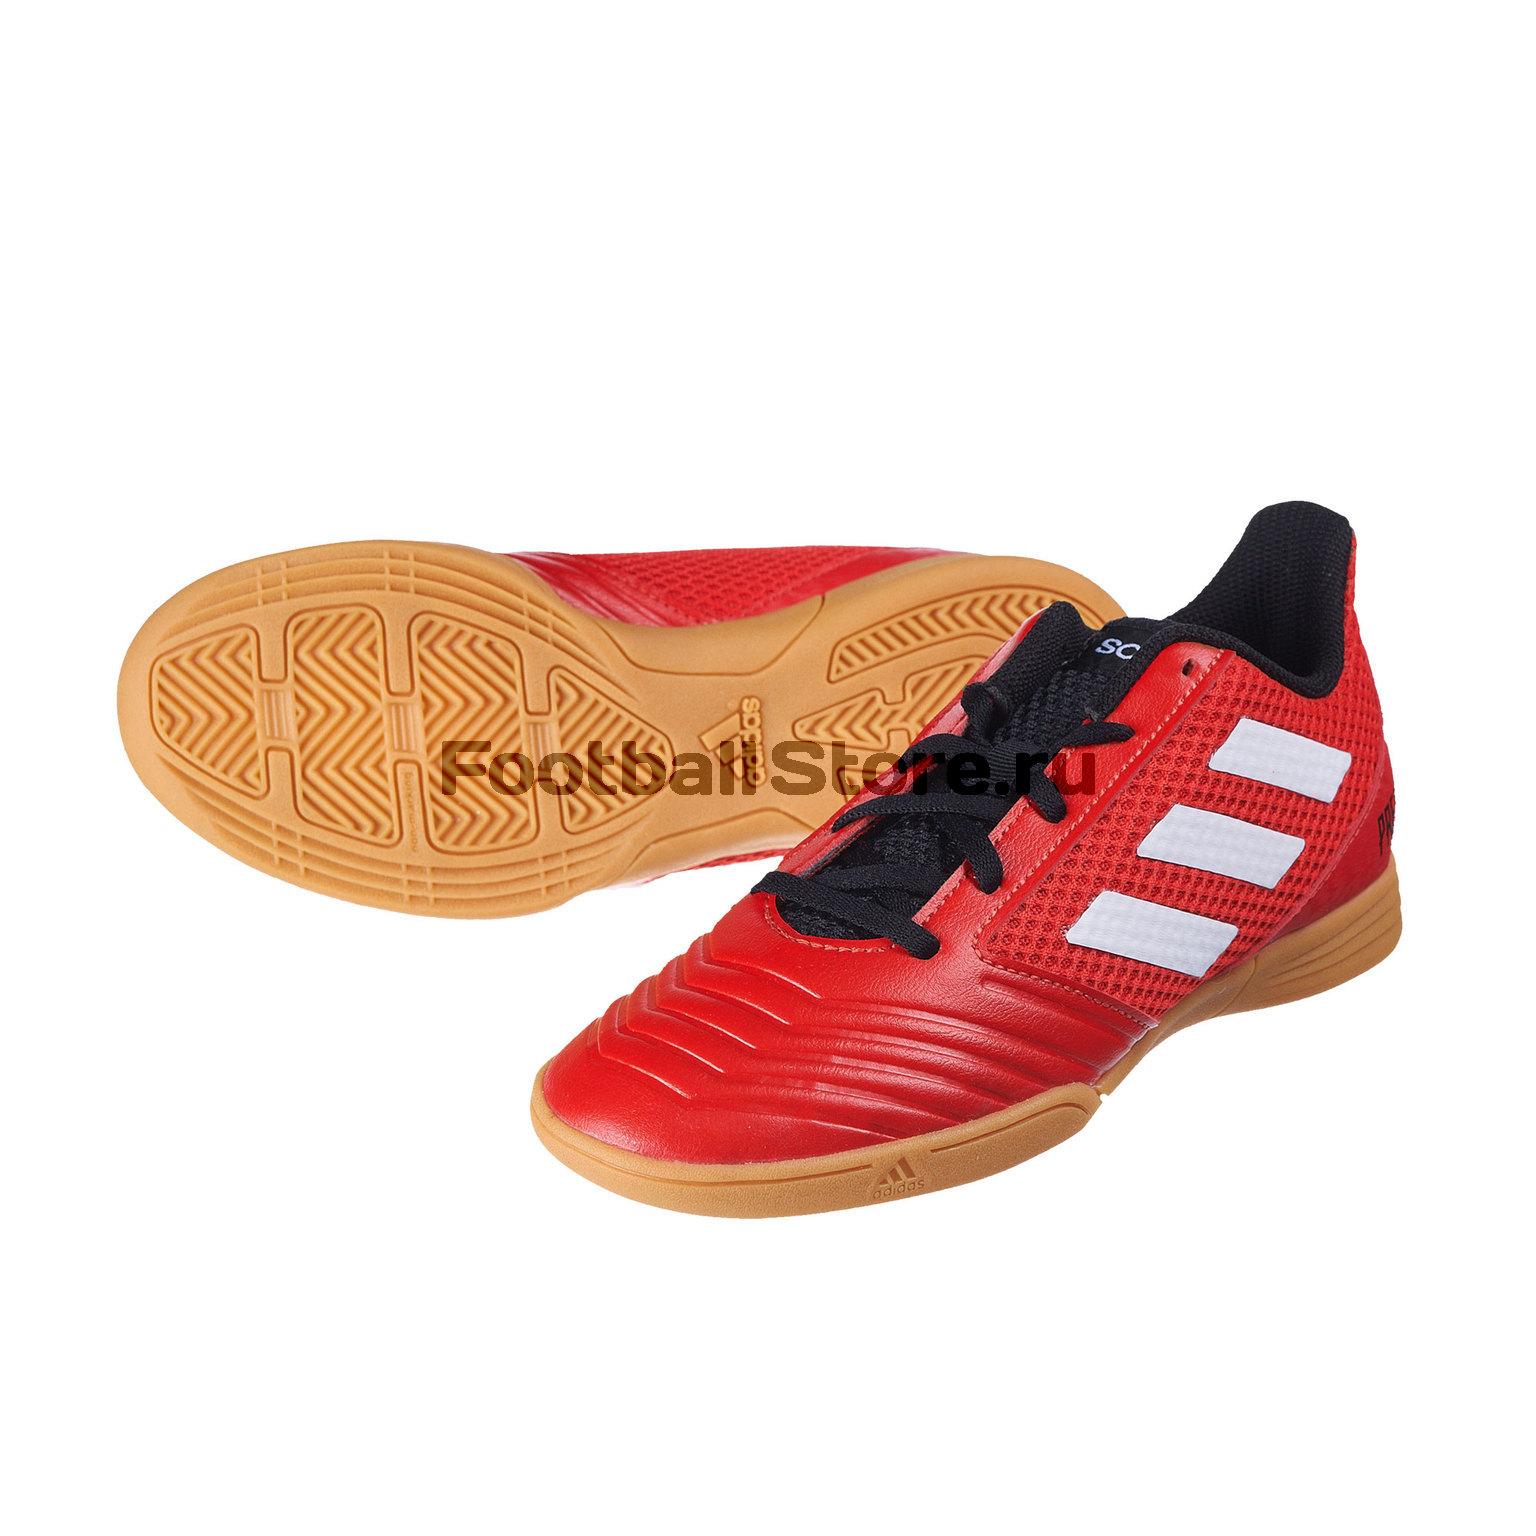 Футзалки детские Adidas Predator Tango 18.4 IN DB2343 цена